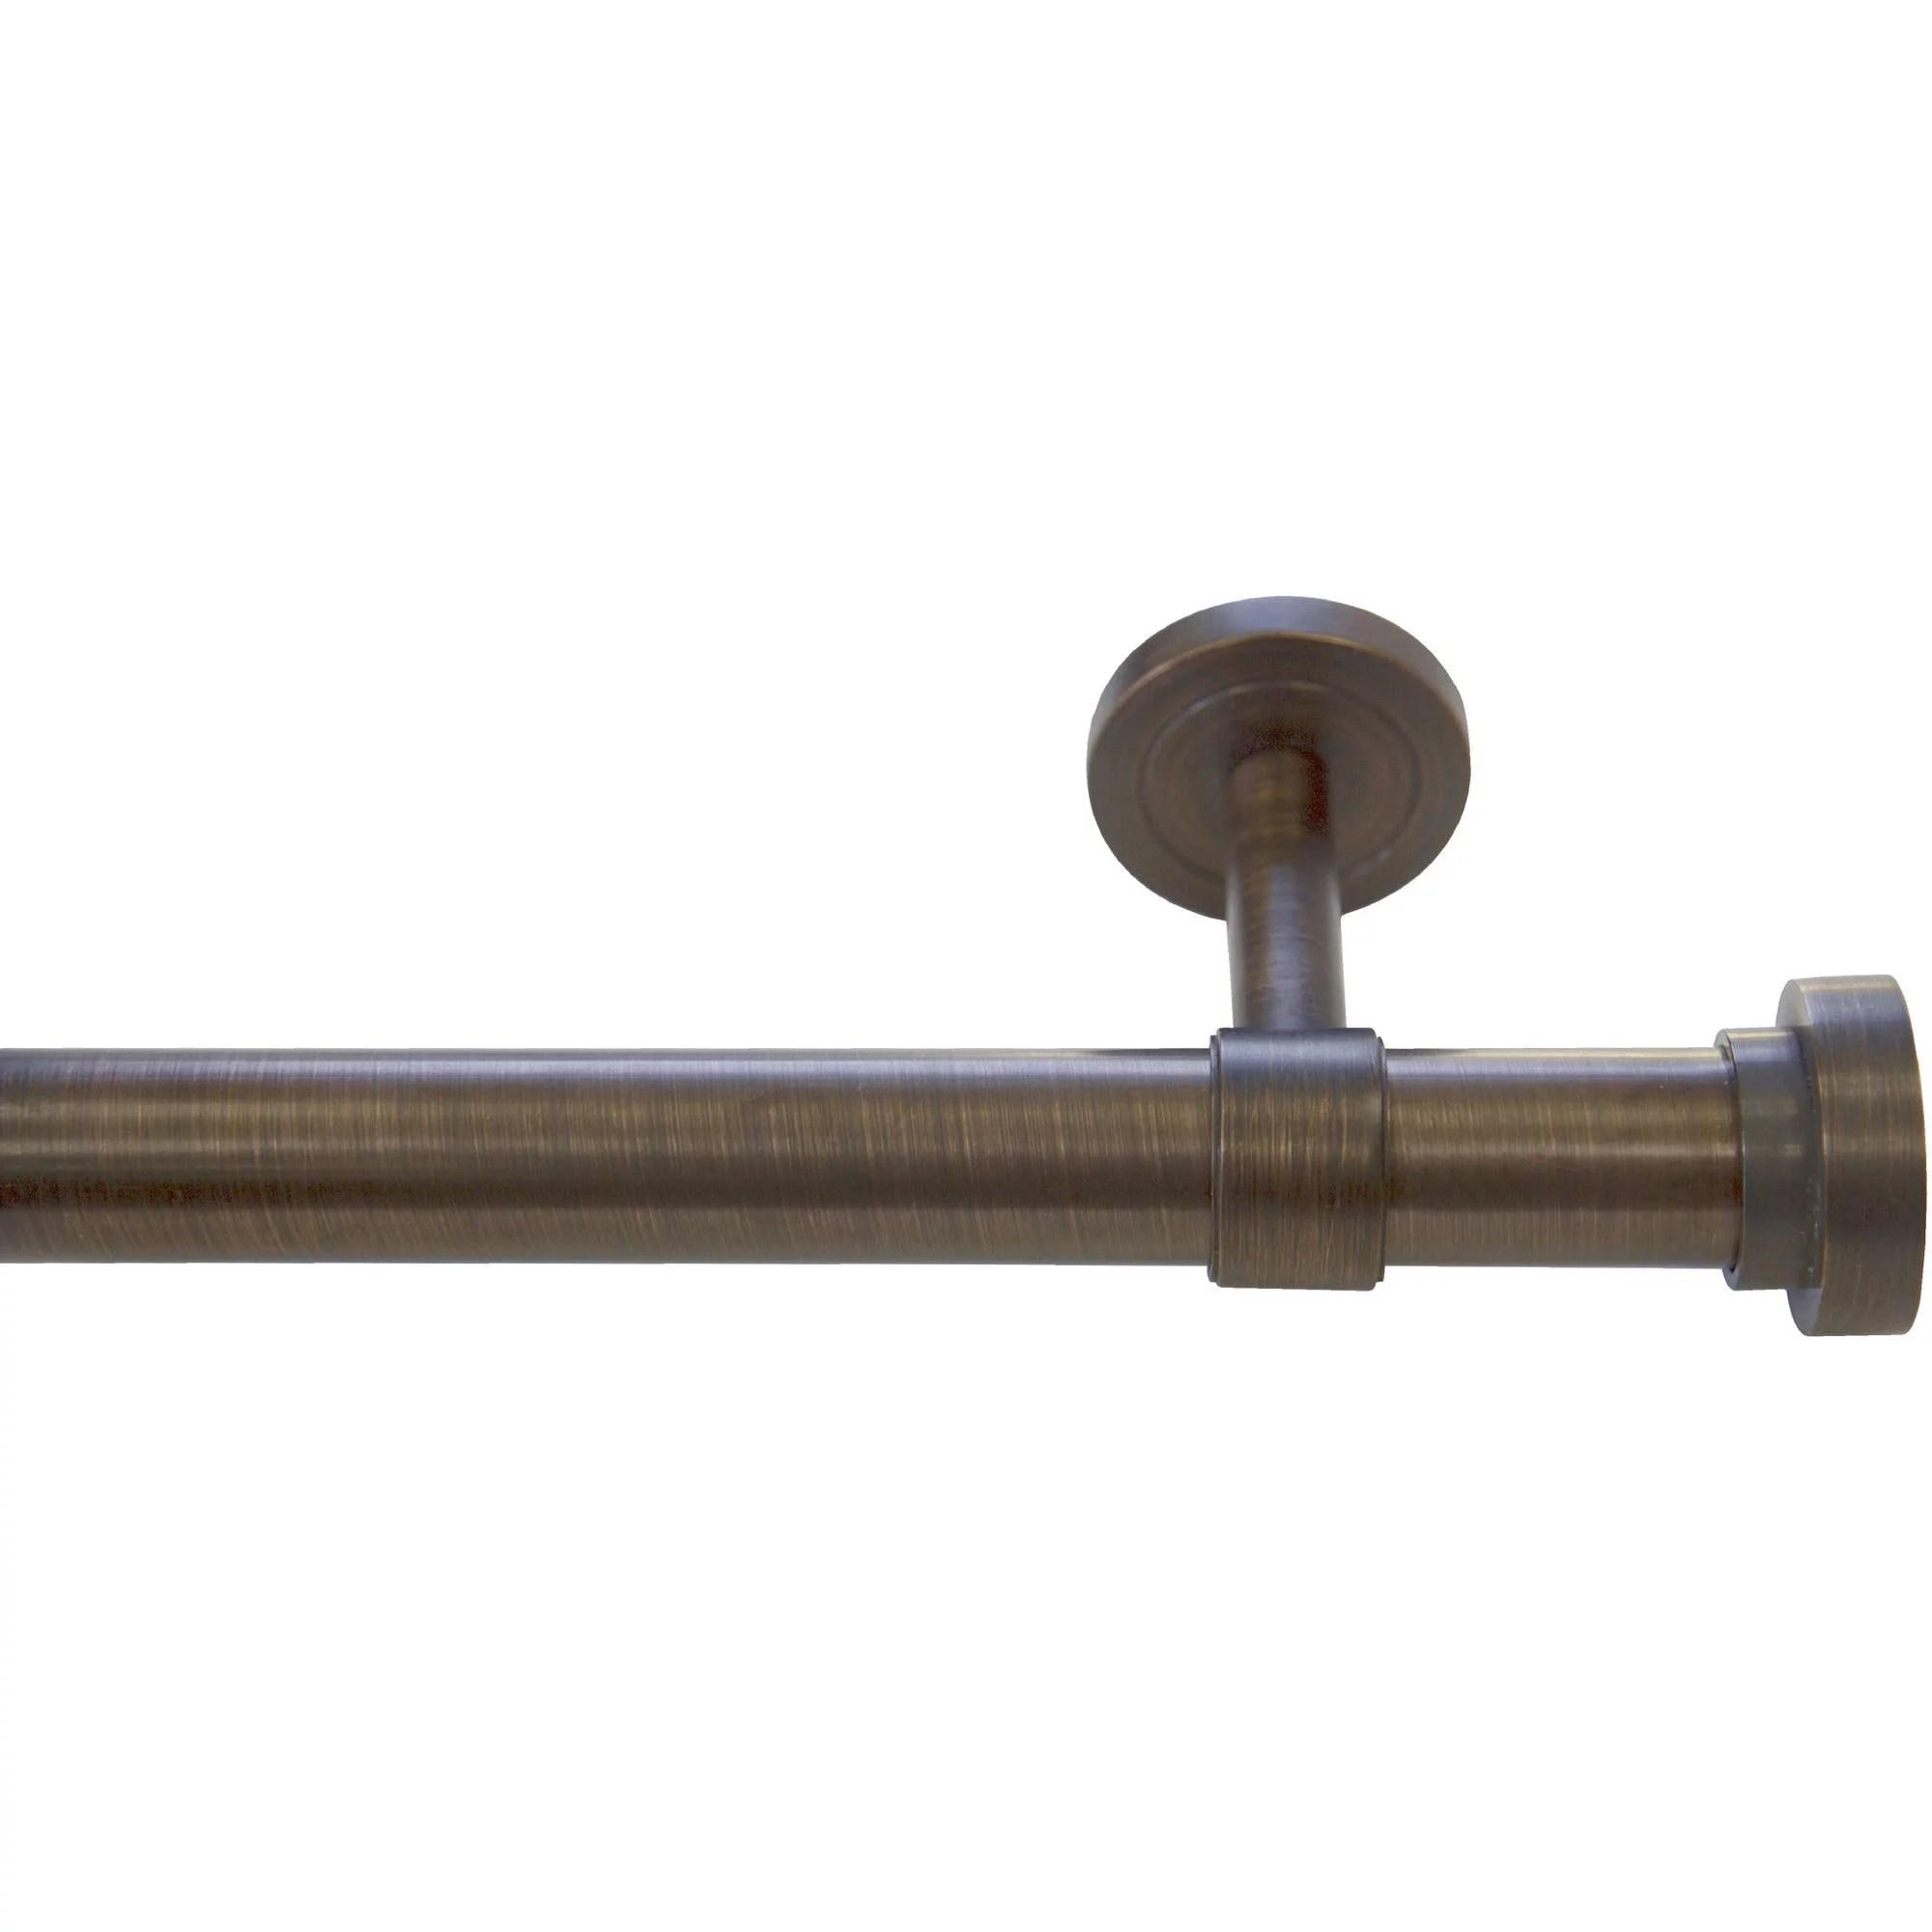 bali 1 end cap decorative curtain rod set 36 66 or 66 120